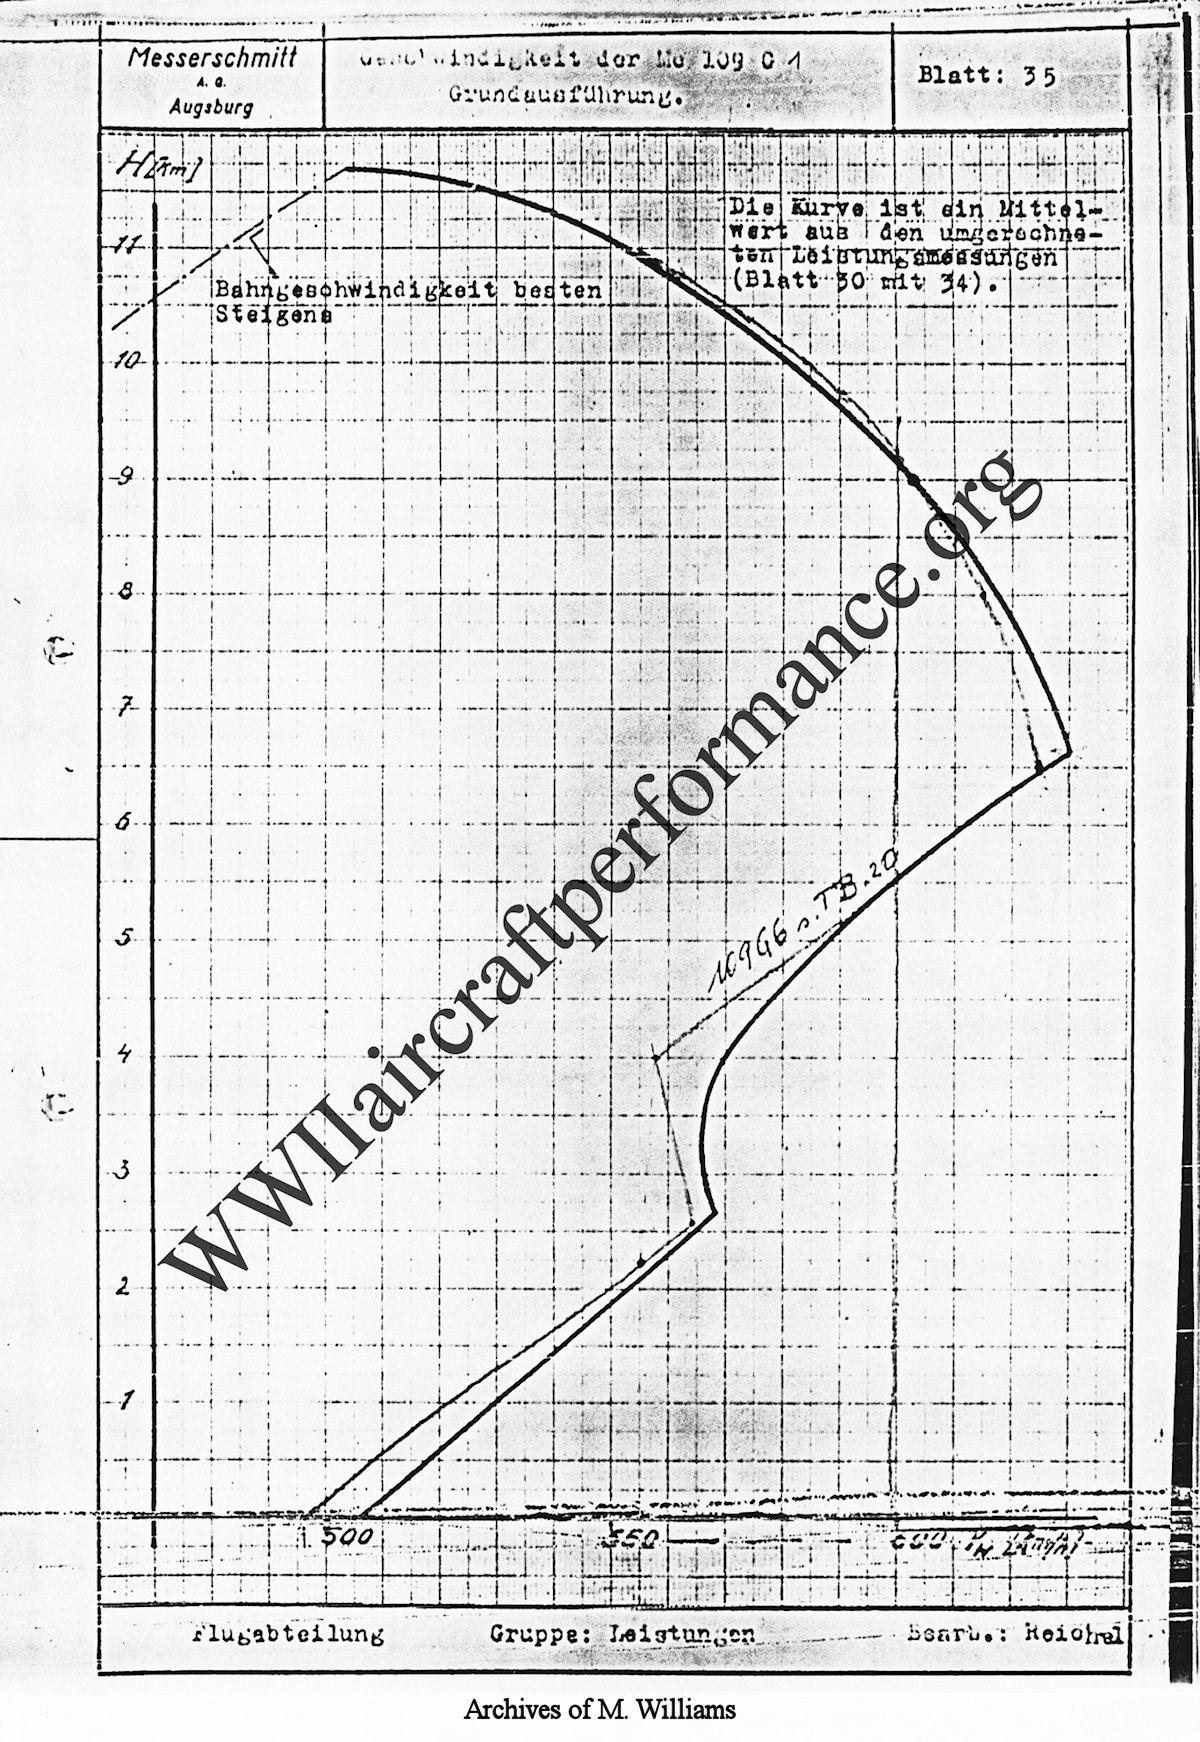 hess chart test